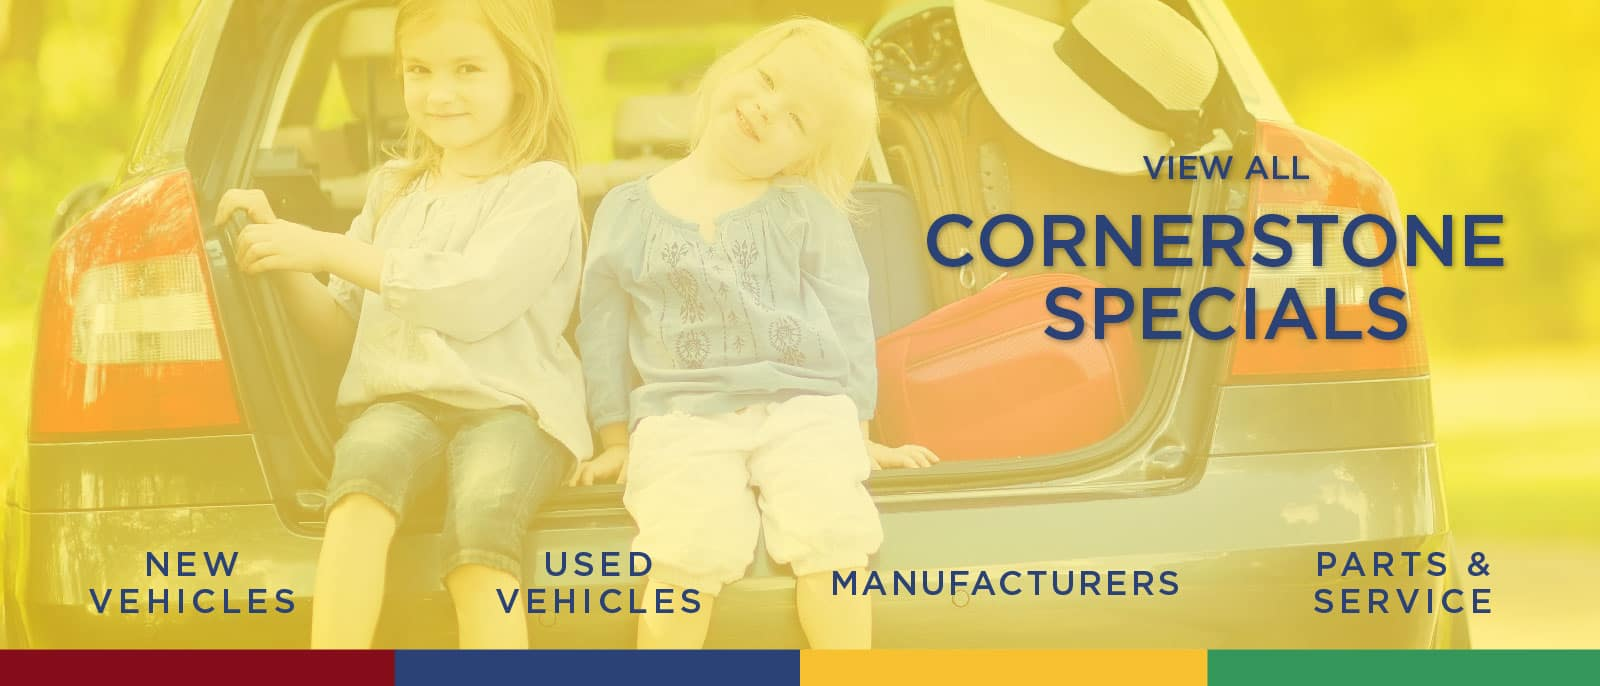 2019-Cornerstone-SpecialsBanner-CHEVY-Yellow